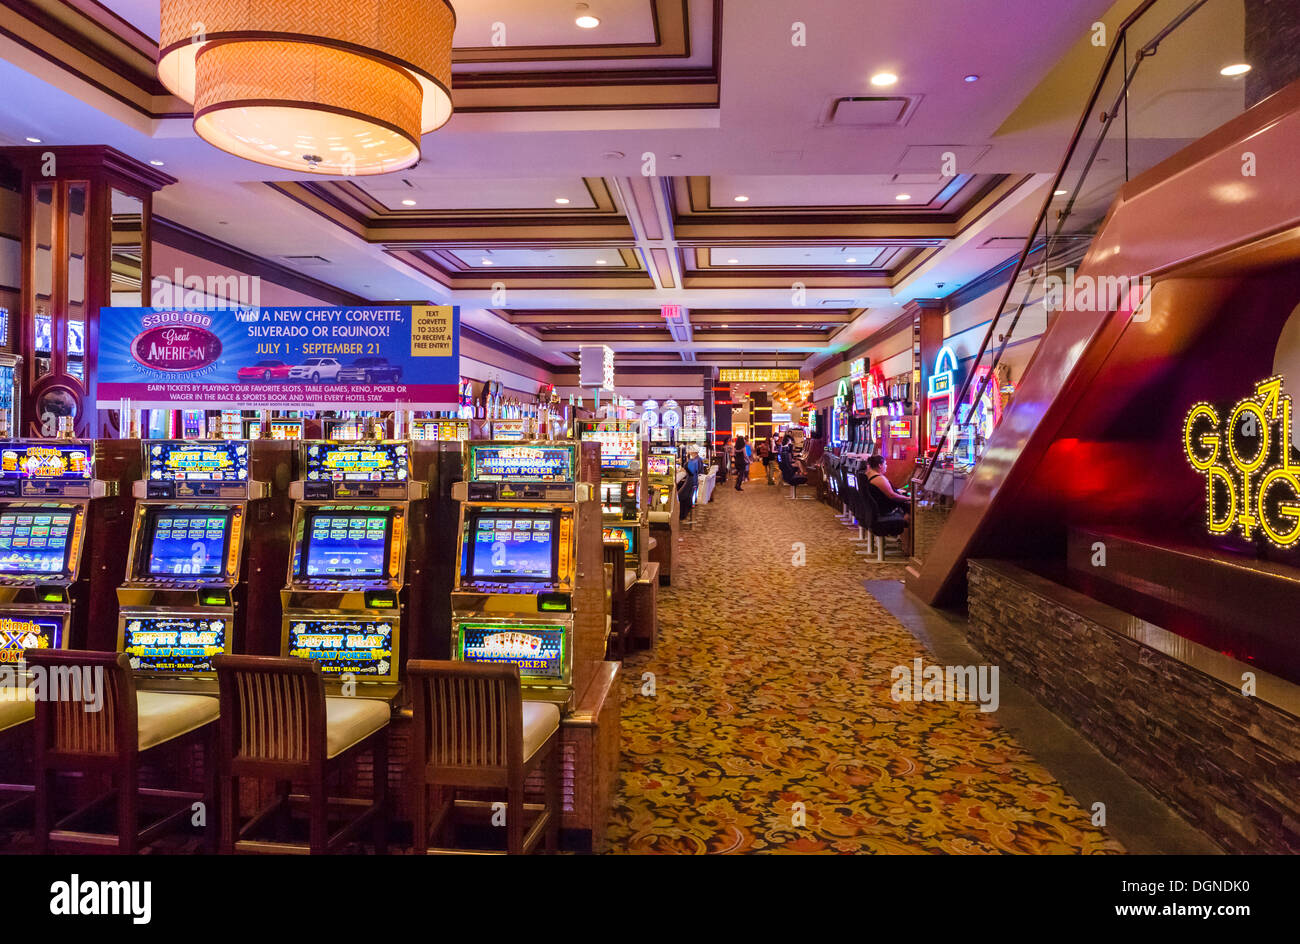 Golden nugget casino las vegas nevada vip poker deluxe apk